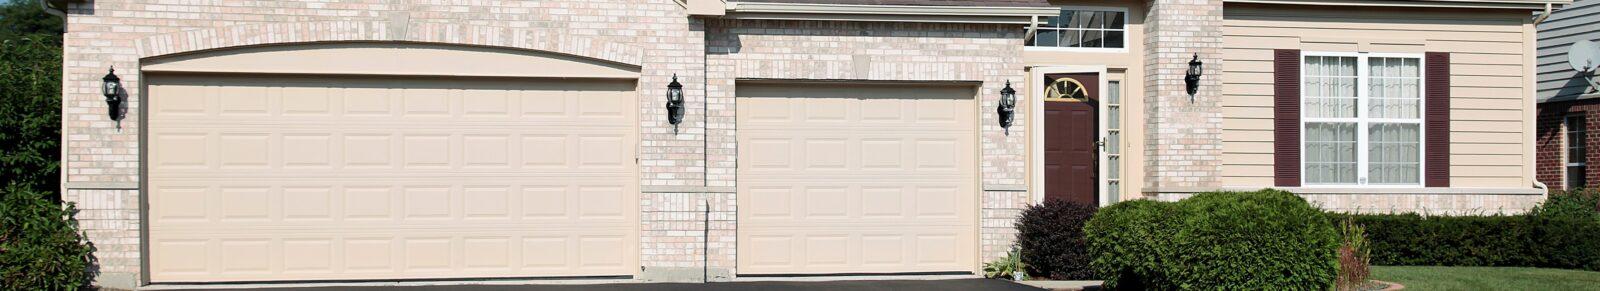 Garage Door Repair Pasadena Best Garage Doors Repair In Pasadena